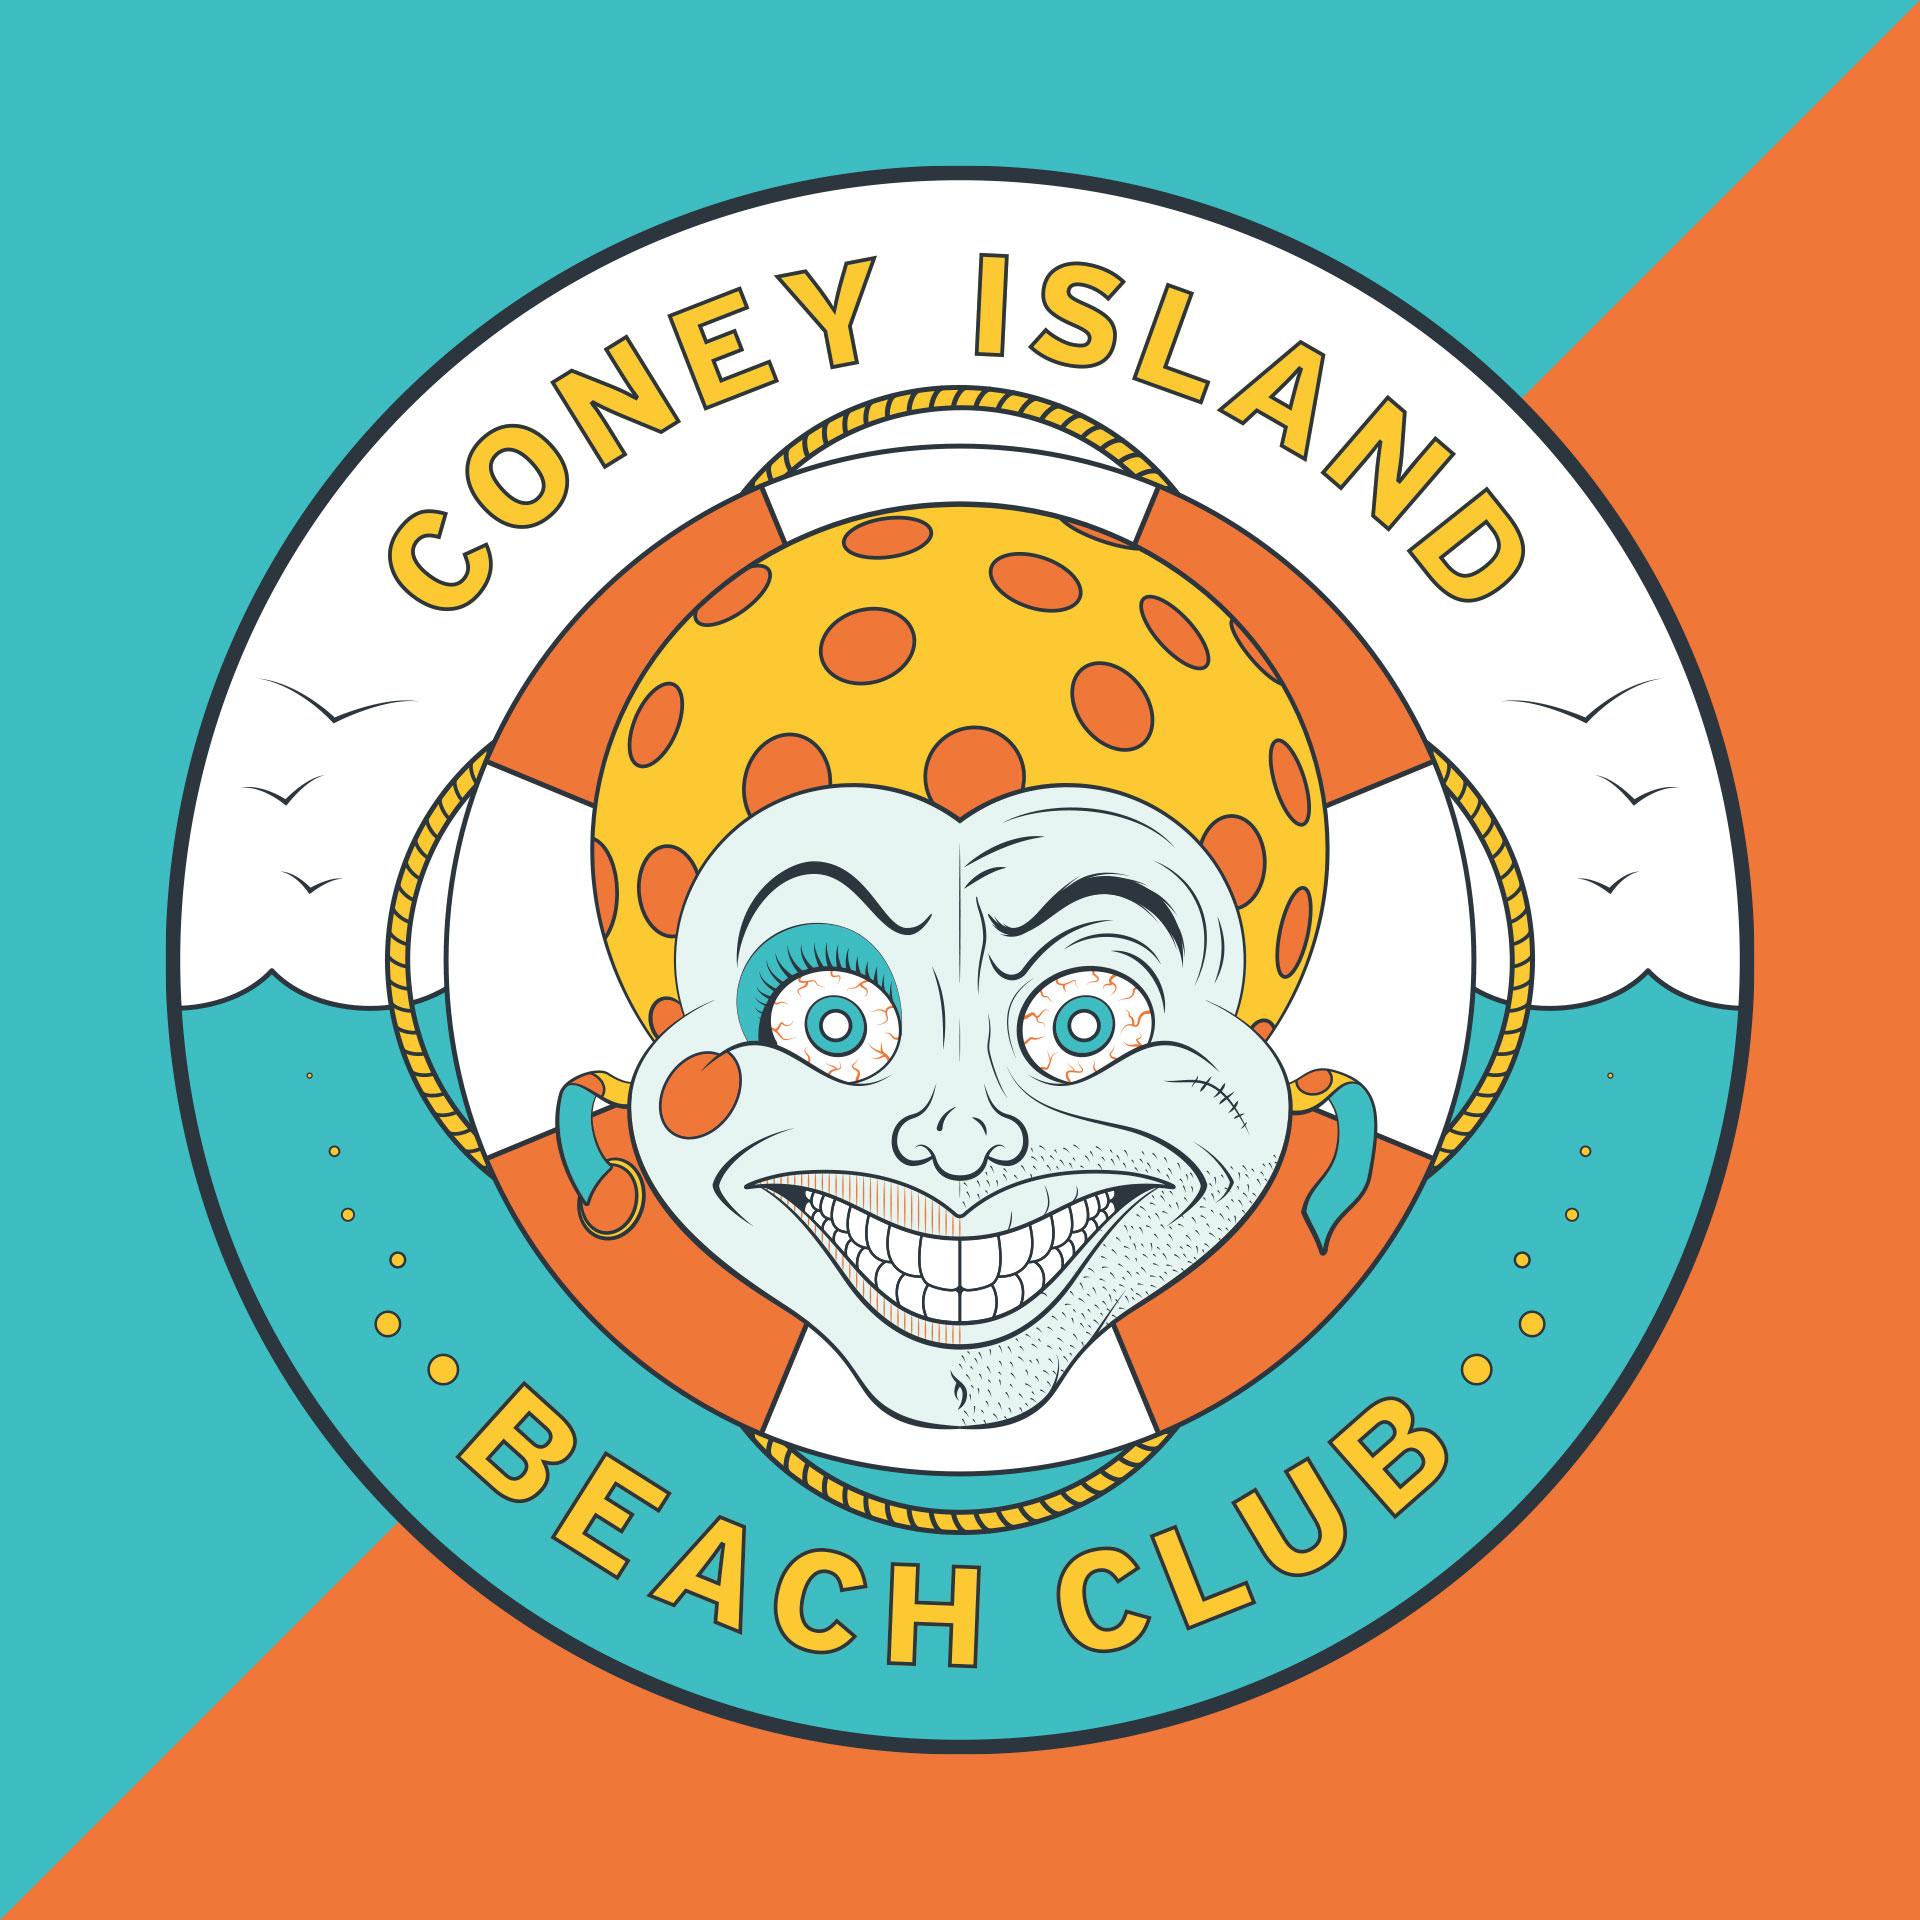 coney_island_beach_club_branding_01.jpg